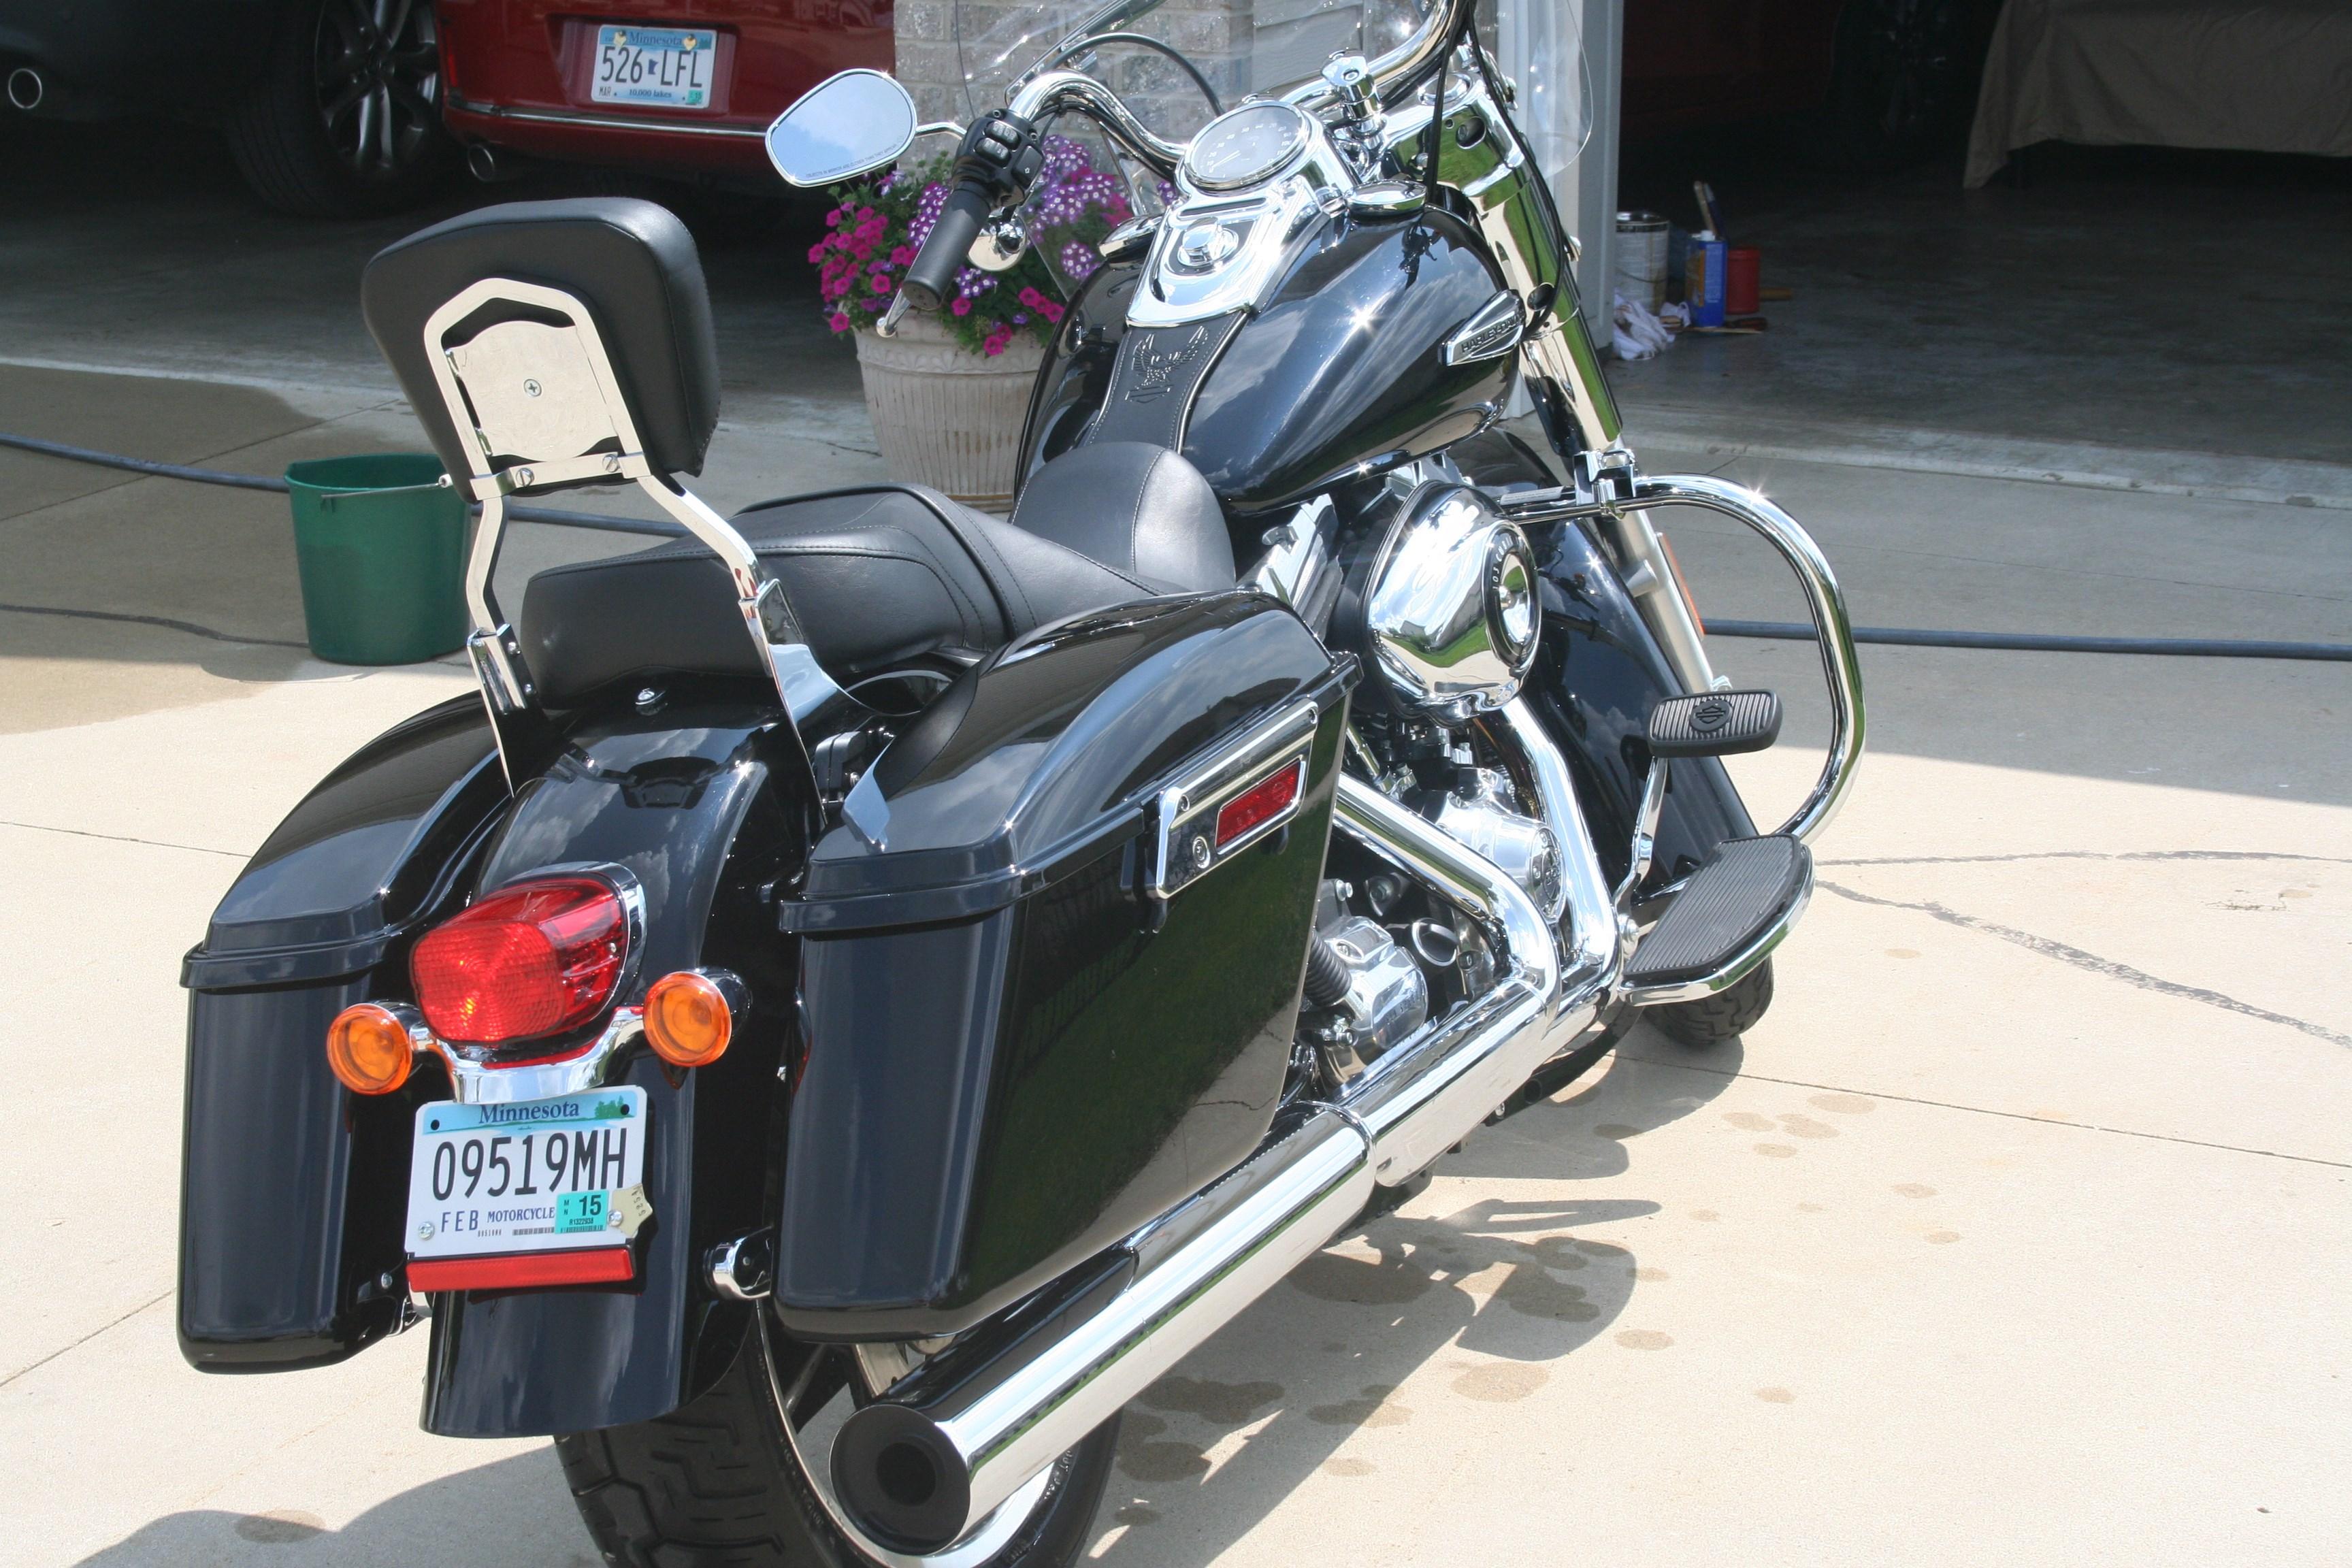 New Dyna Motorcycles For Sale Minnesota >> 2012 Harley-Davidson® FLD Dyna® Switchback (Black), Rochester, Minnesota (644220) | ChopperExchange